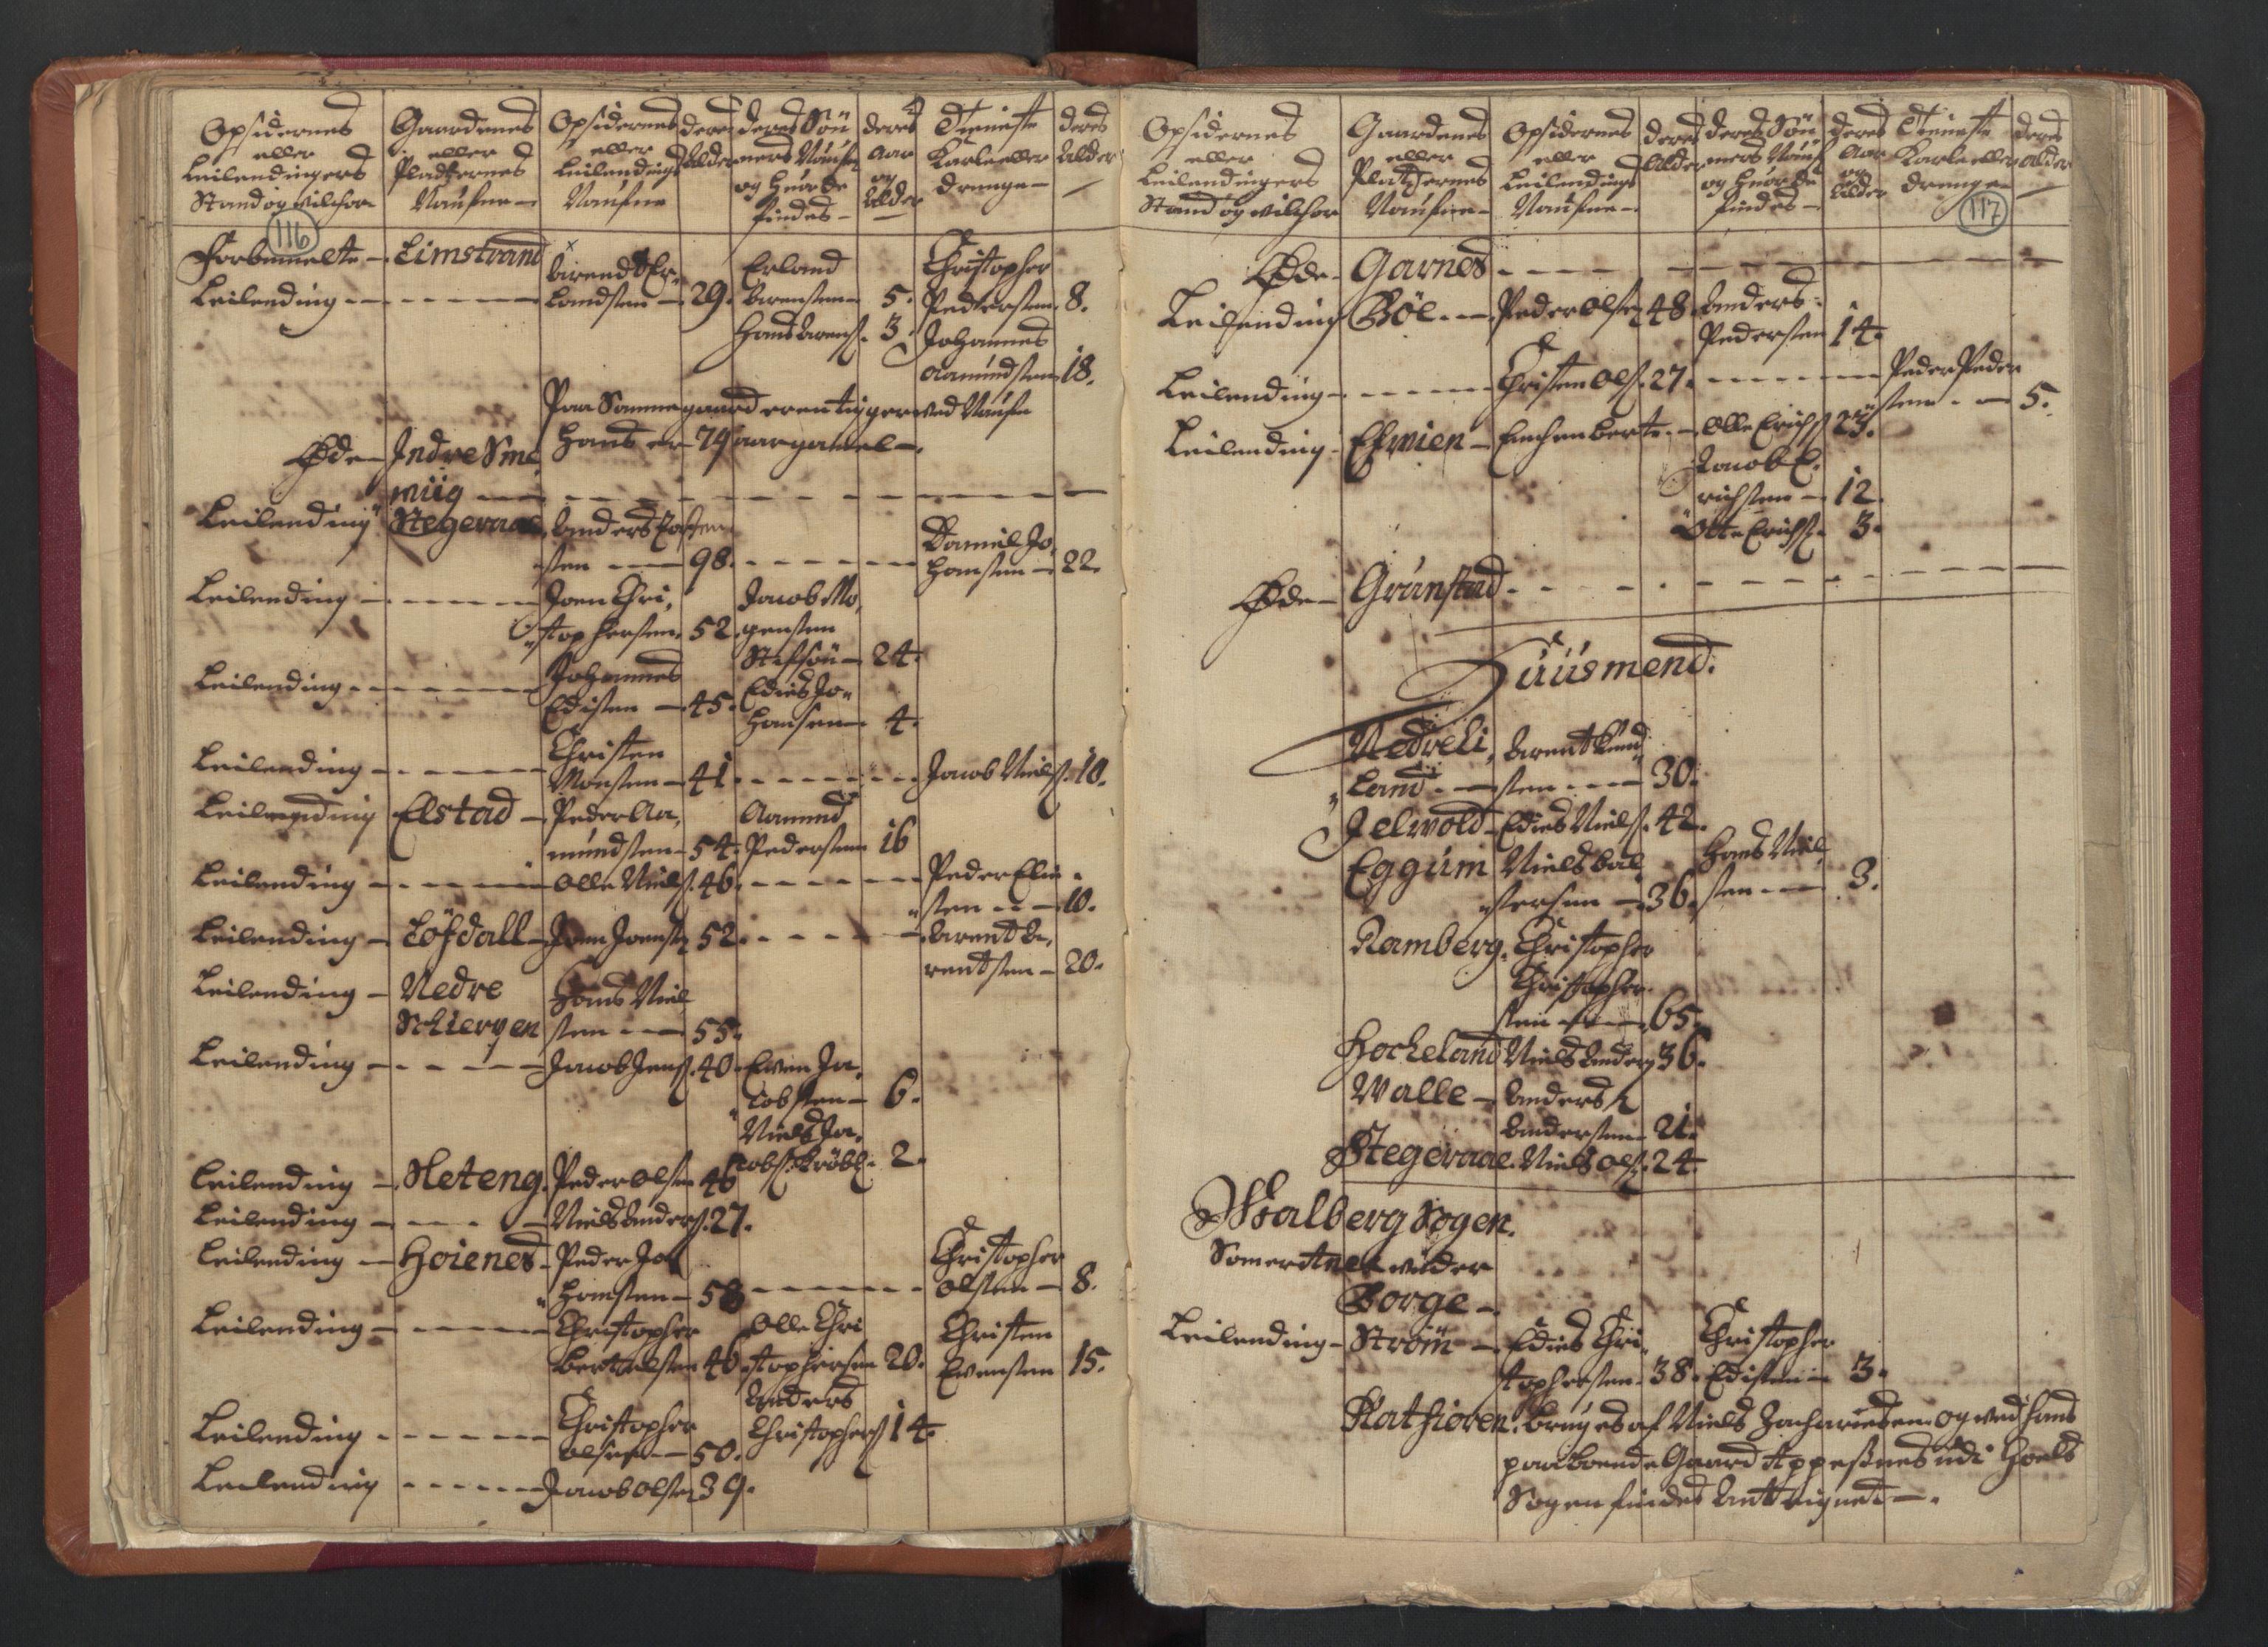 RA, Manntallet 1701, nr. 18: Vesterålen, Andenes og Lofoten fogderi, 1701, s. 116-117